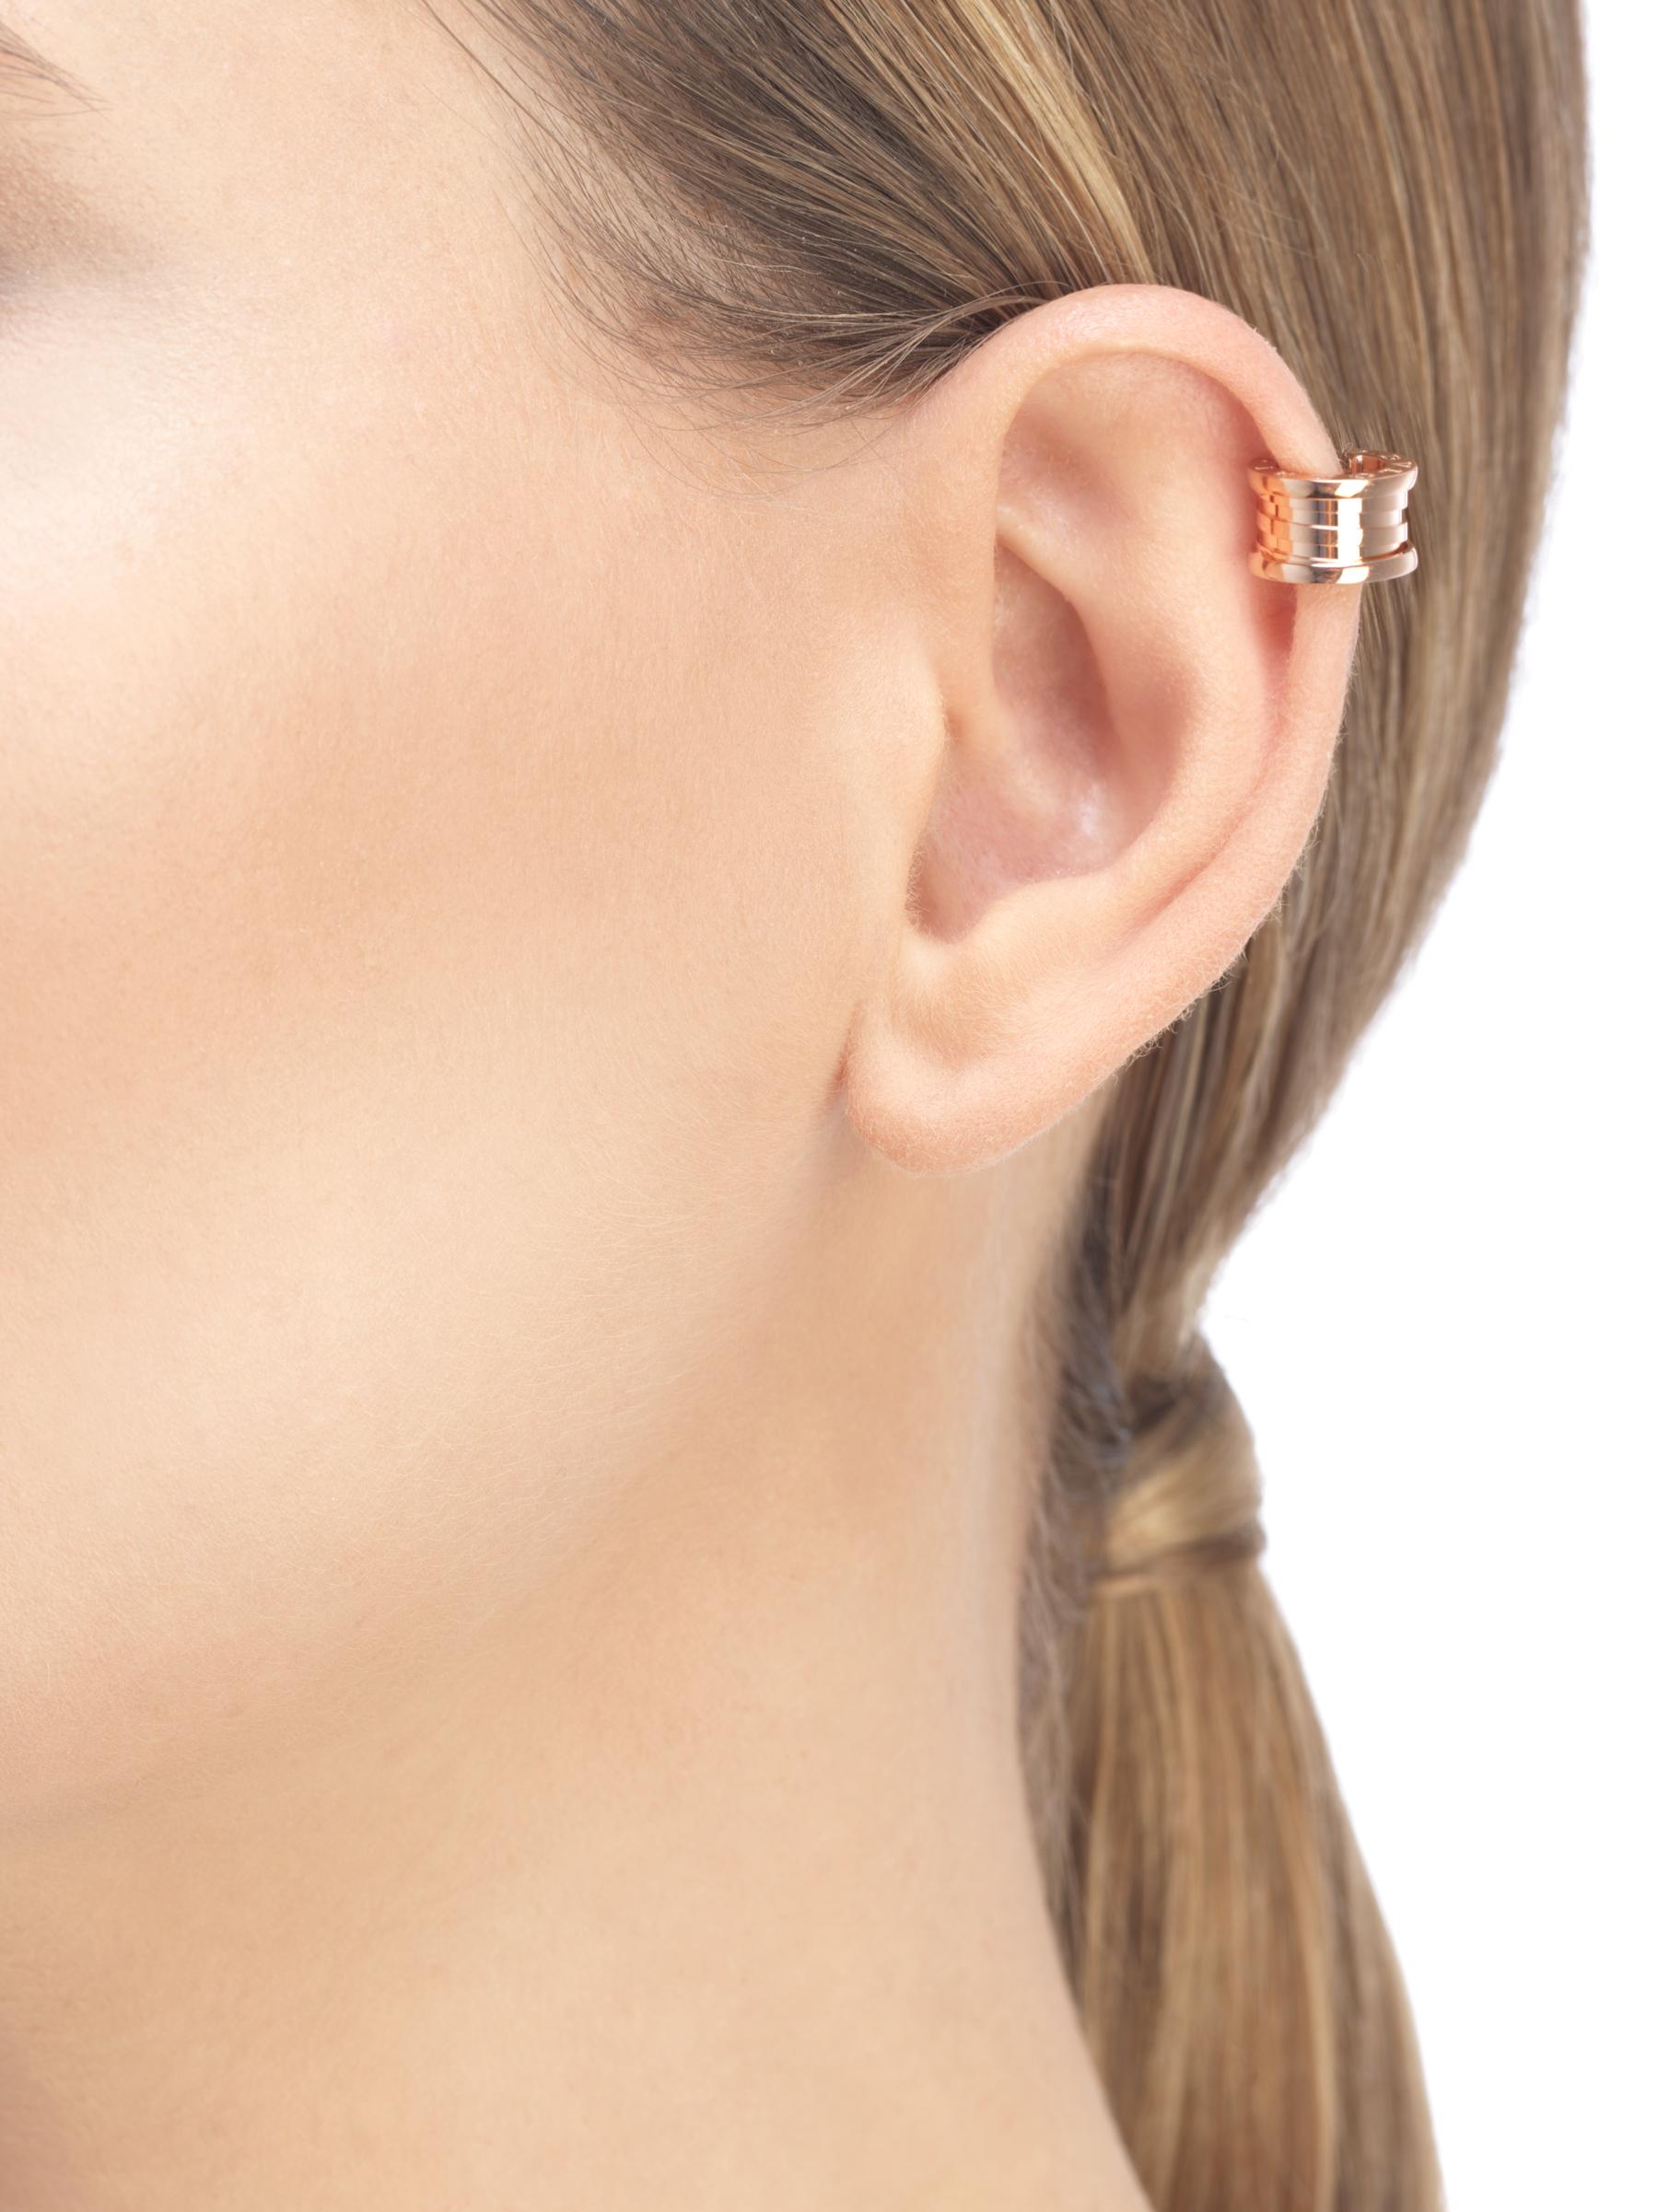 B.zero1 single ear cuff in 18kt rose gold 356163 image 3